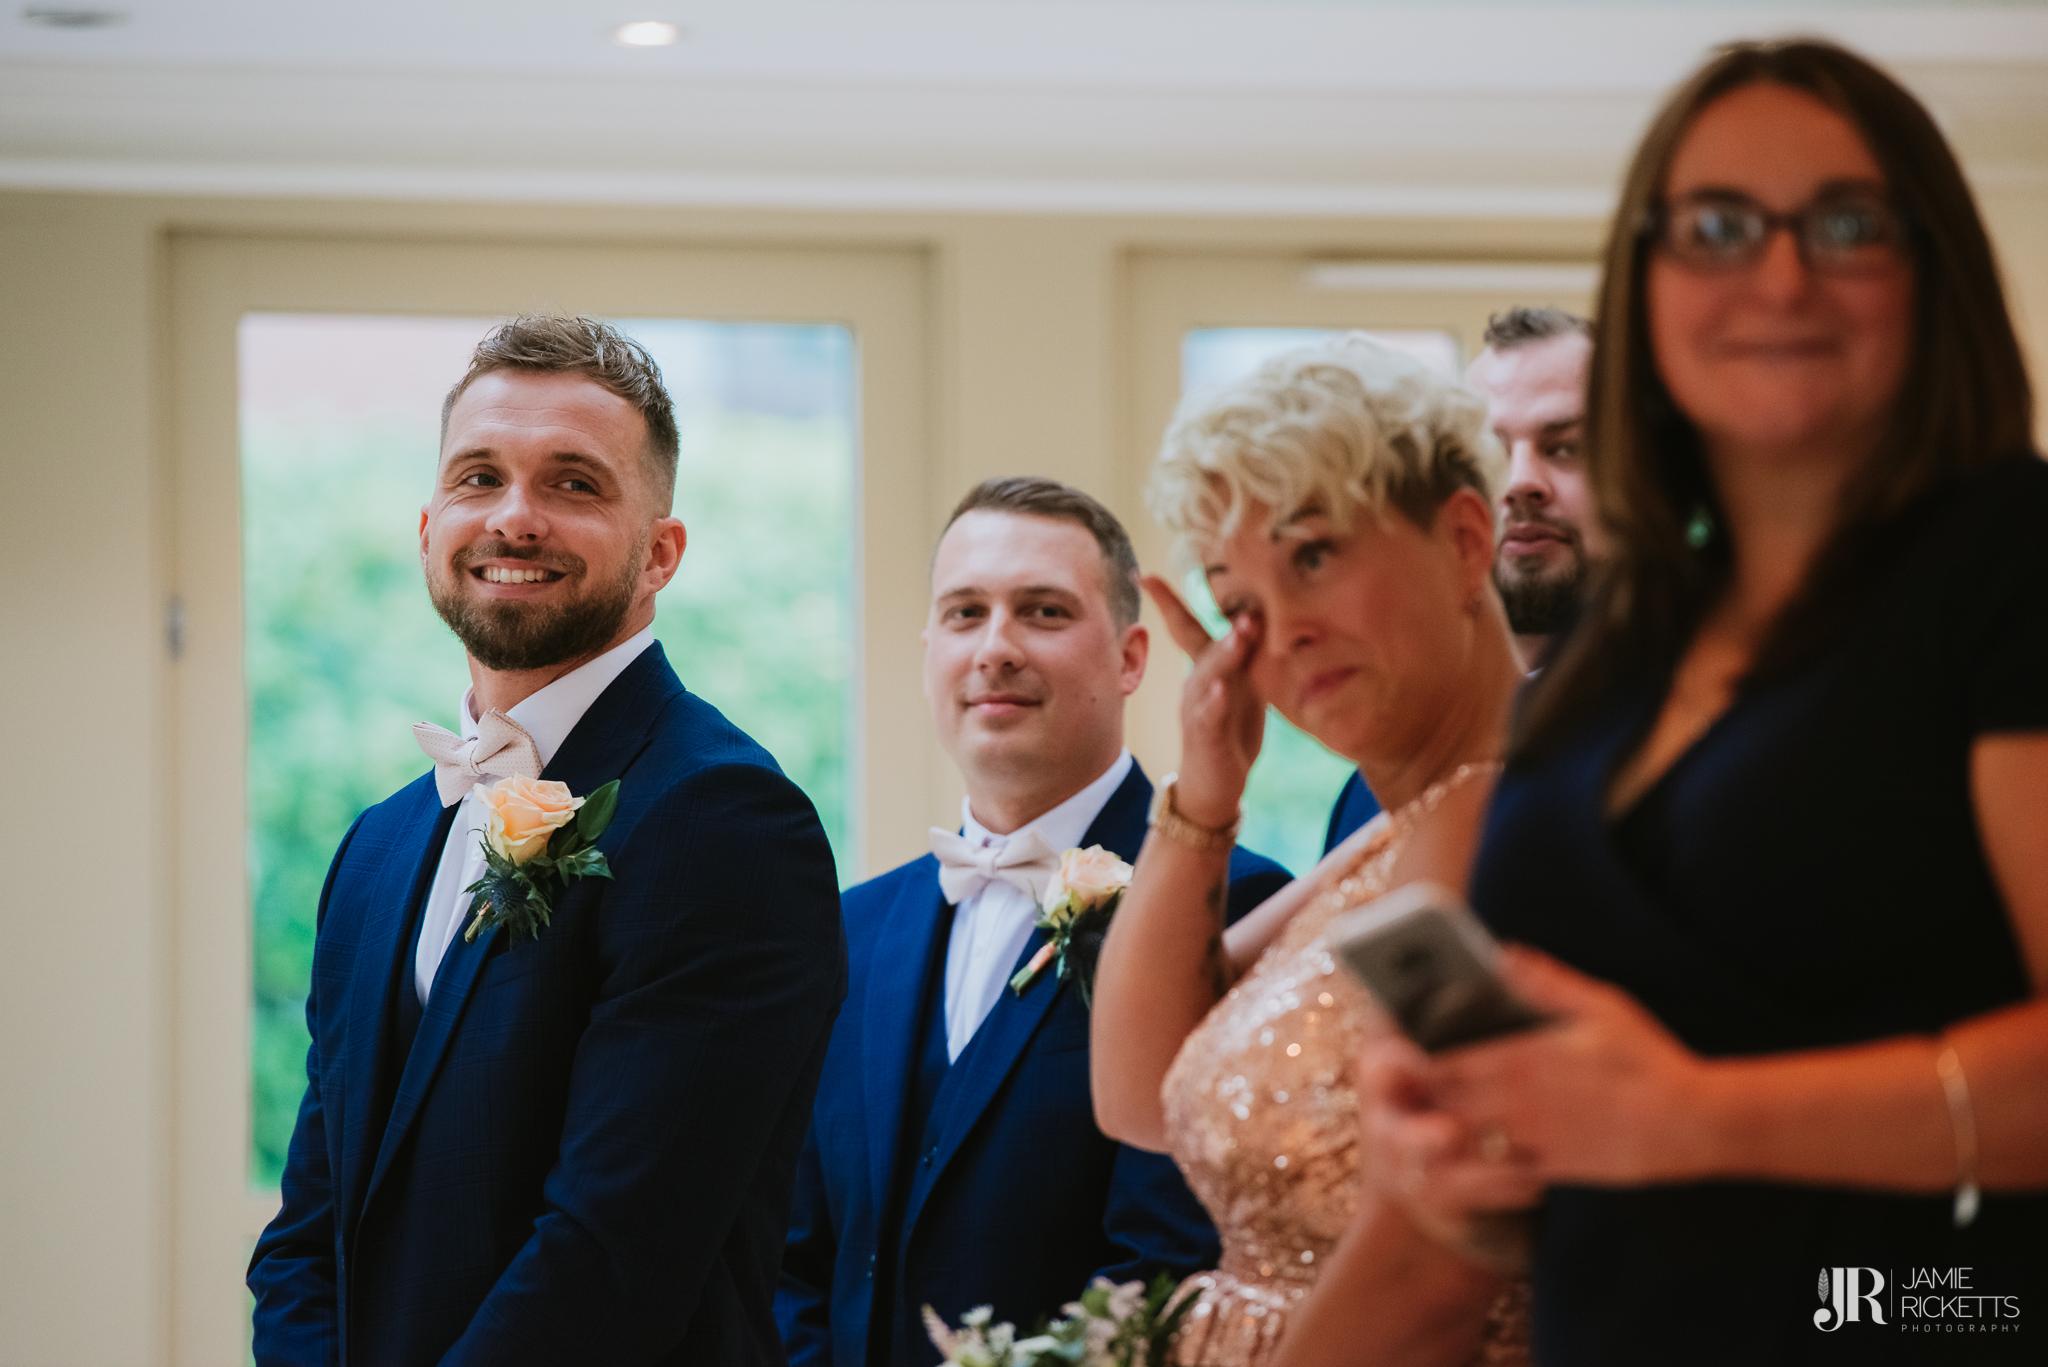 Wedding-Photographer-Shropshire-24.JPG